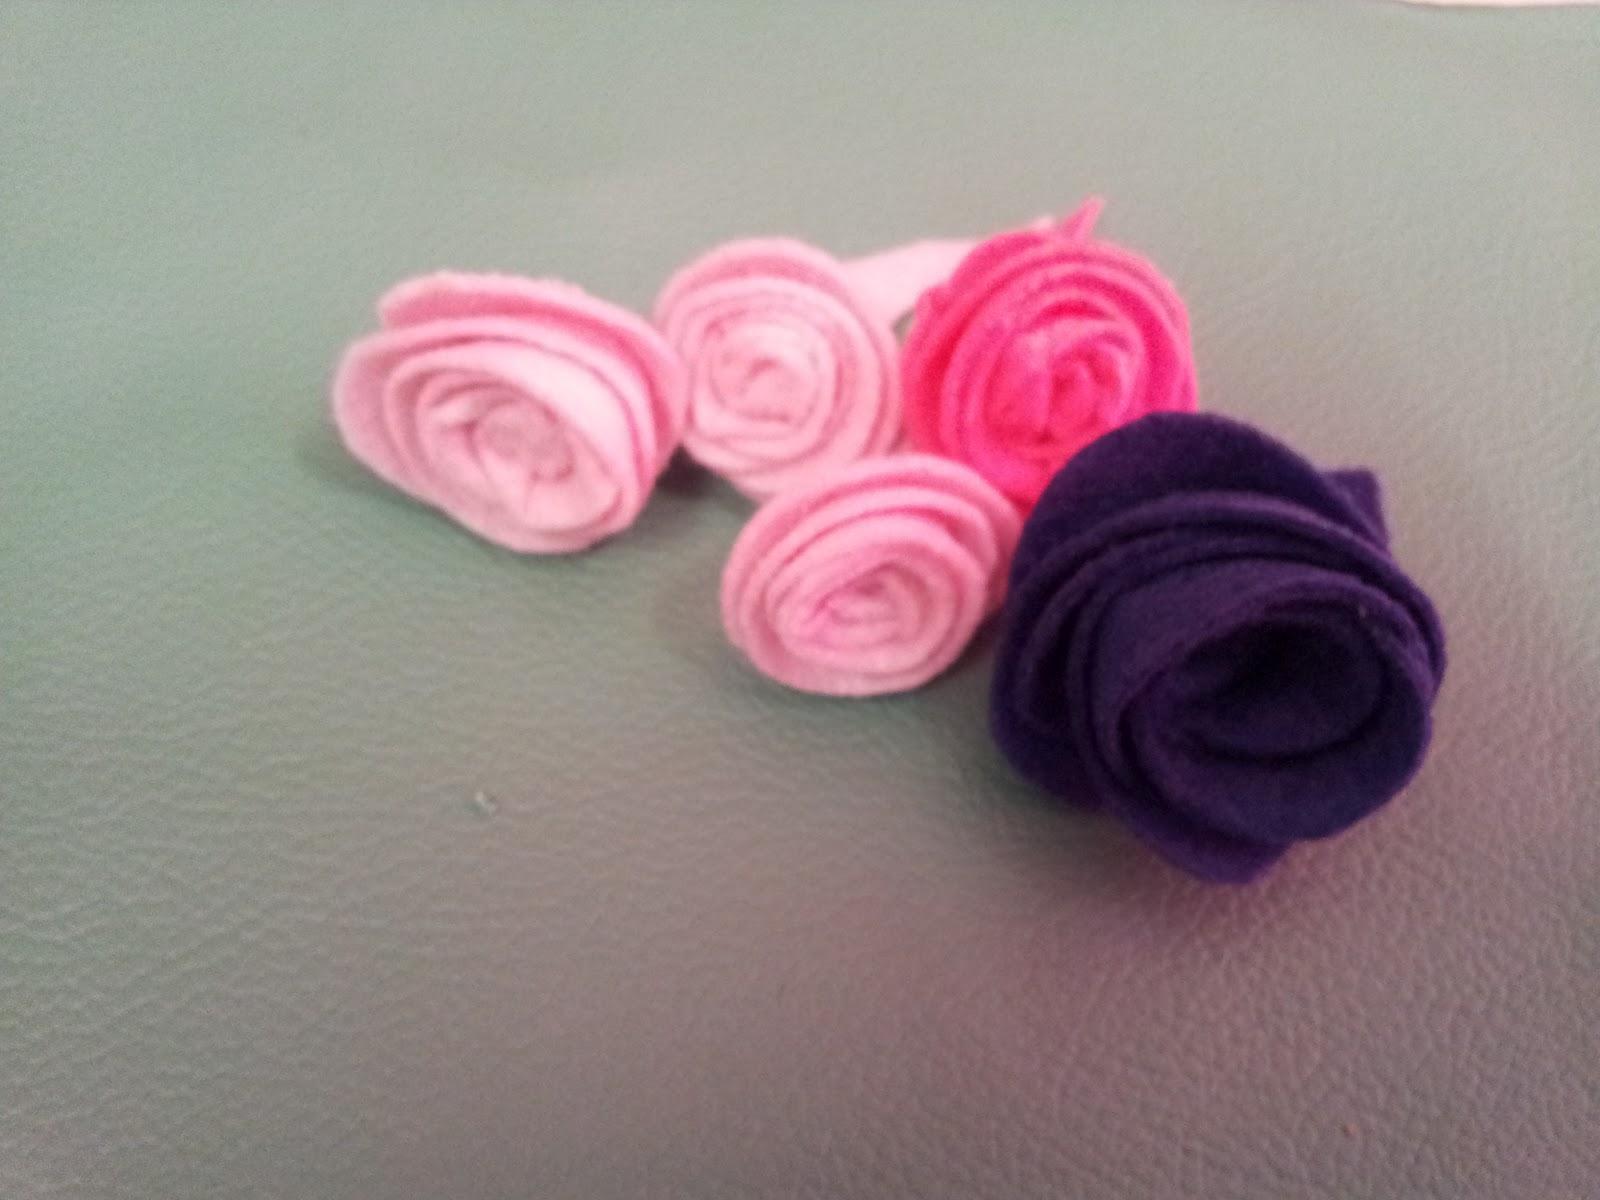 aceh-aceh, bunga ros purple memang sumpah cantik :P